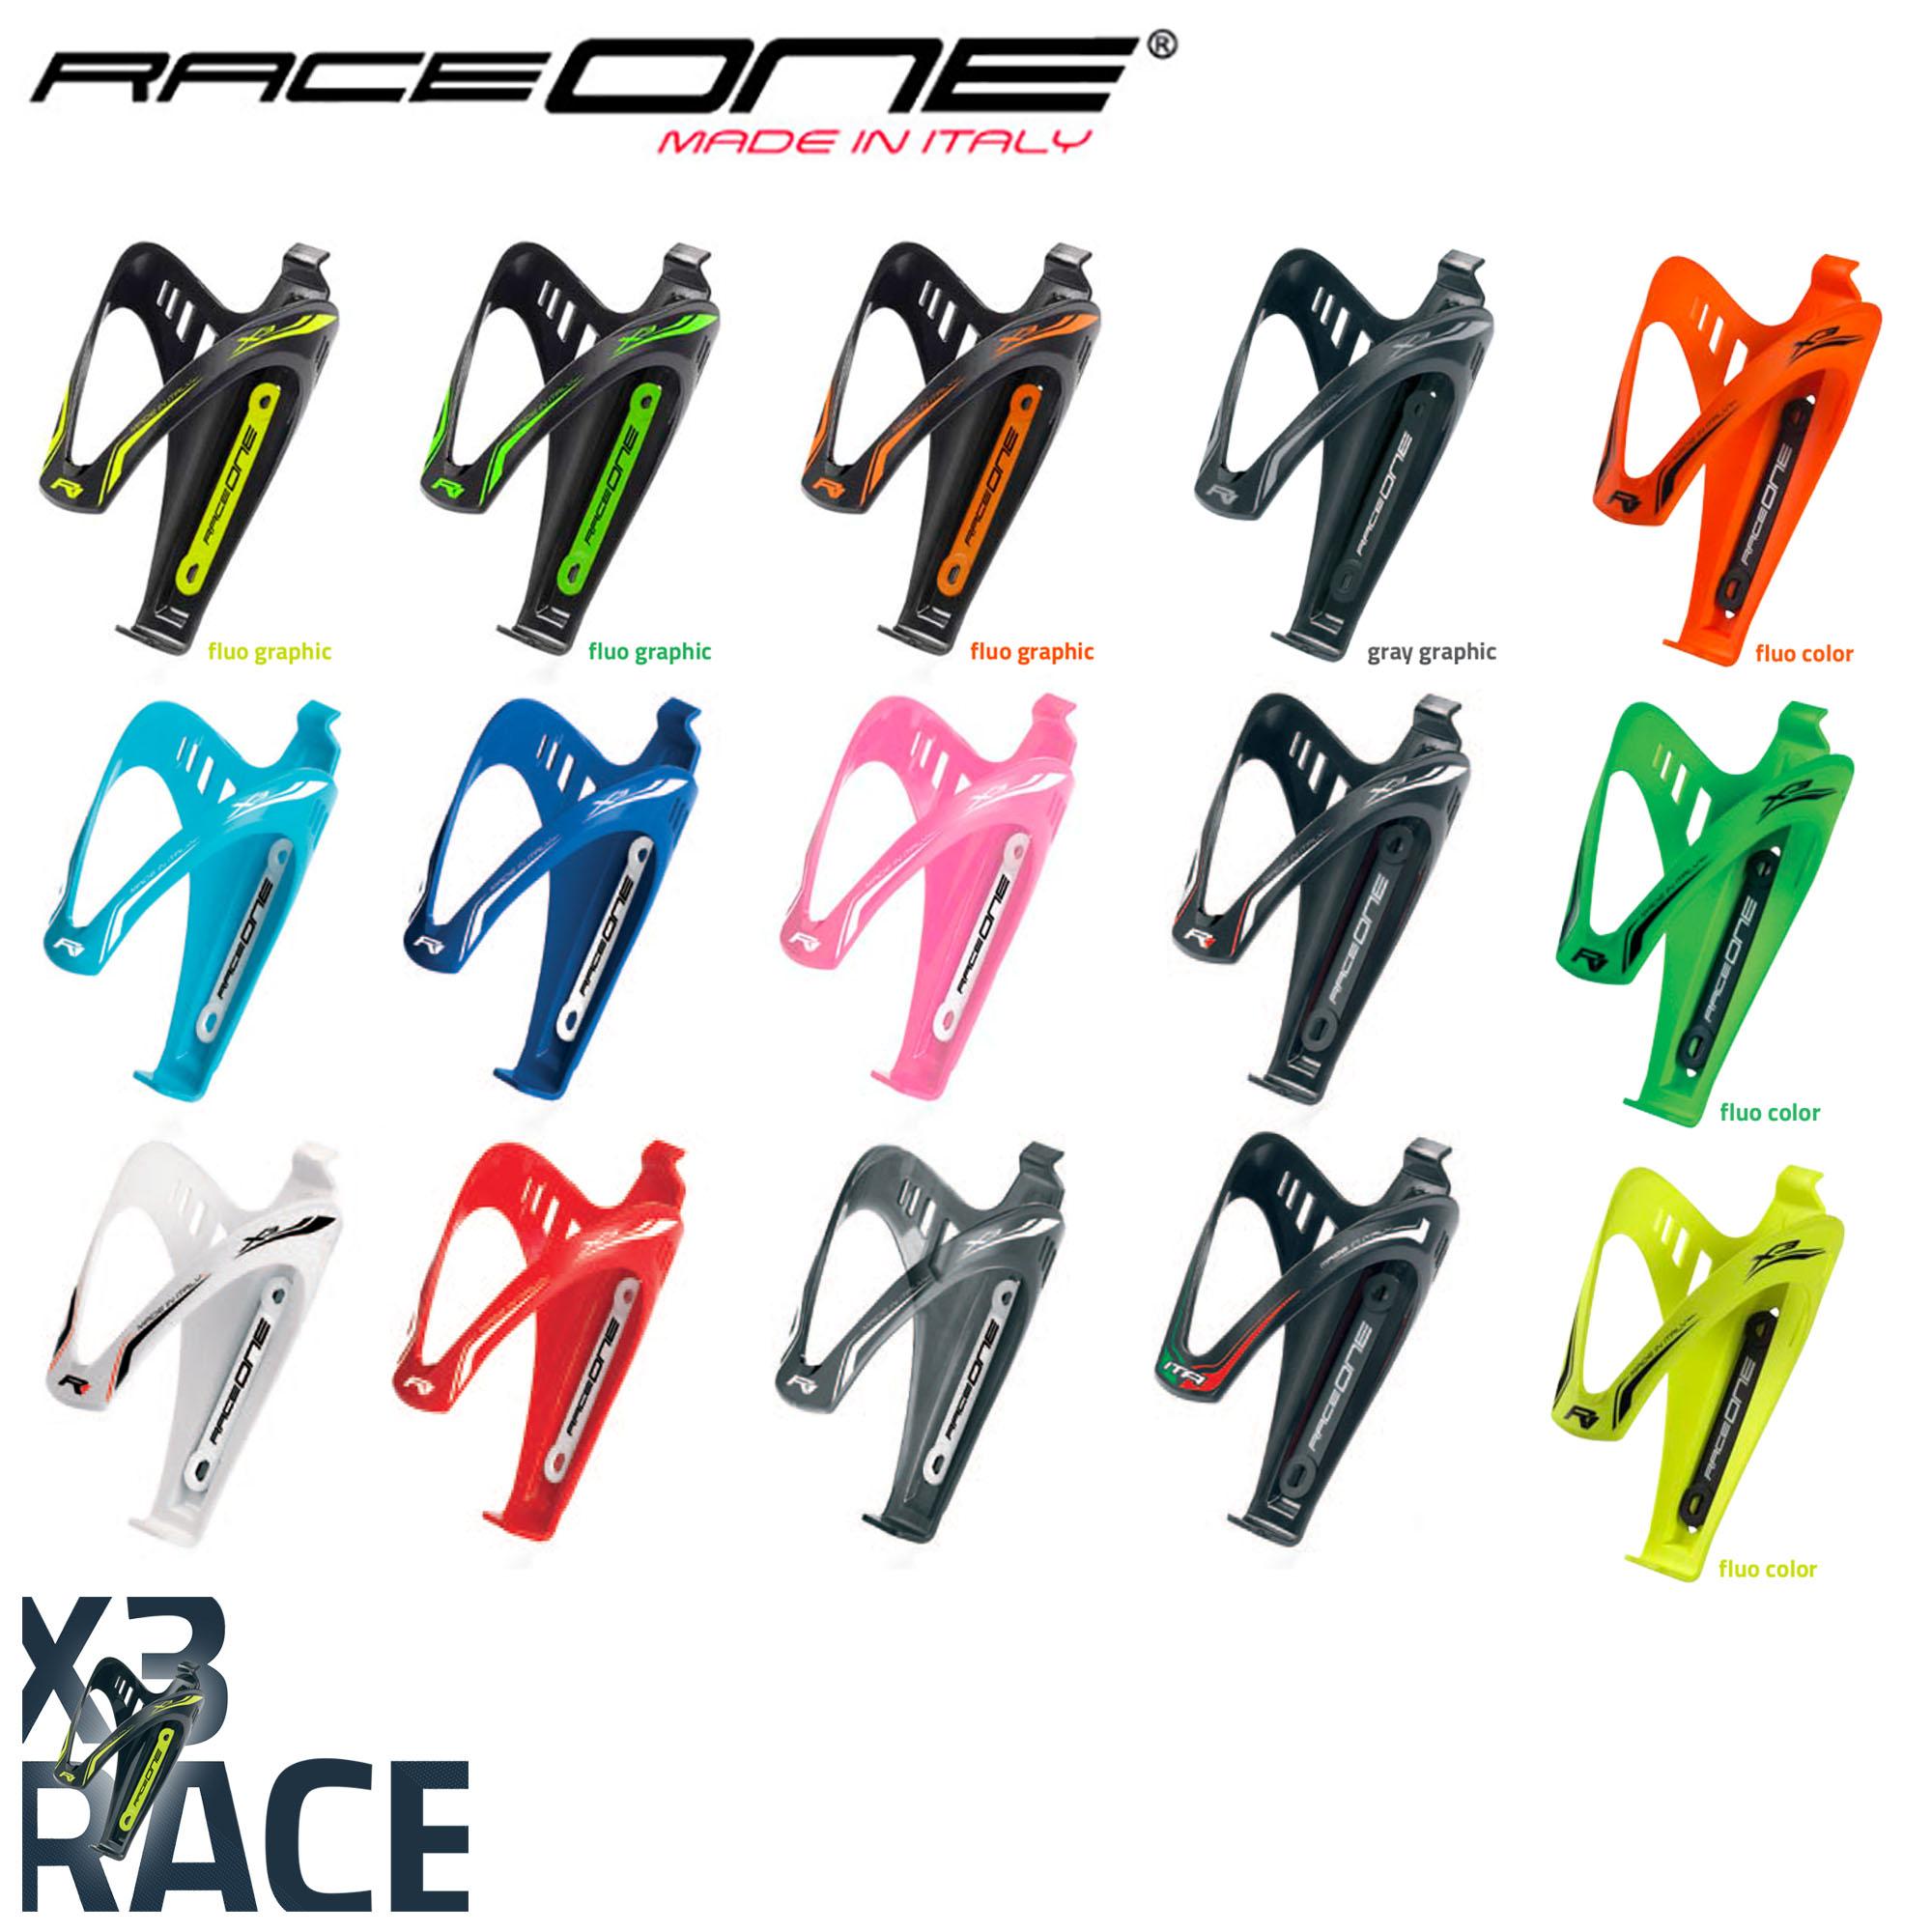 Raceone X3 Race Bottle Cage Holder for Cycling Biking MTB Bike 30 GRAMS